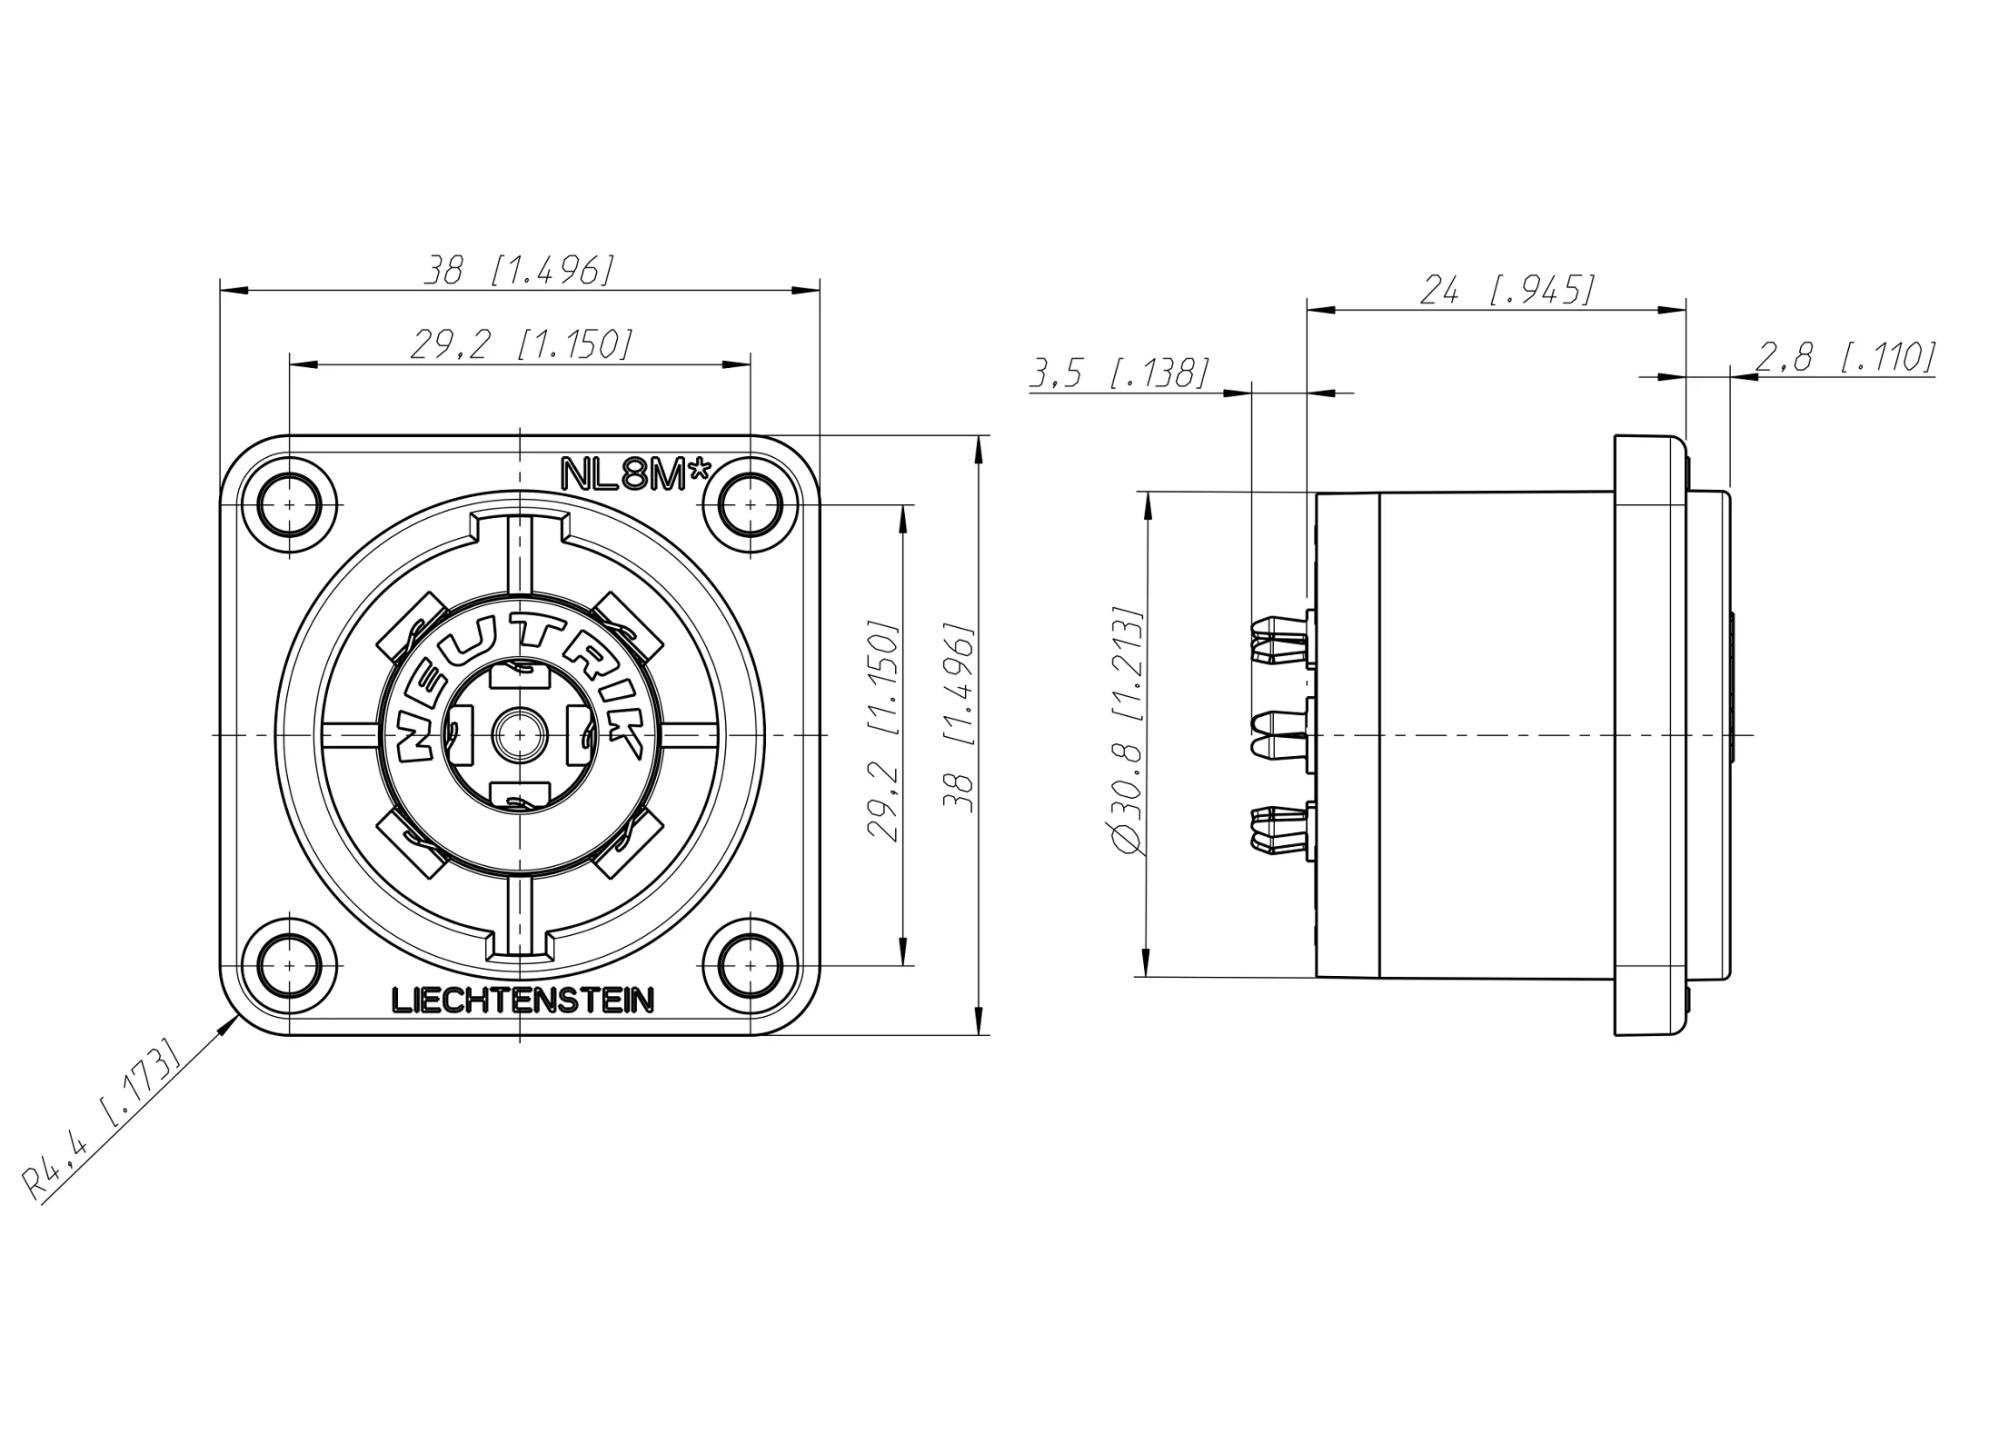 hight resolution of 4 pole speakon wiring diagram xlr wiring diagram wiring speakon to 1 4 wiring bridge to